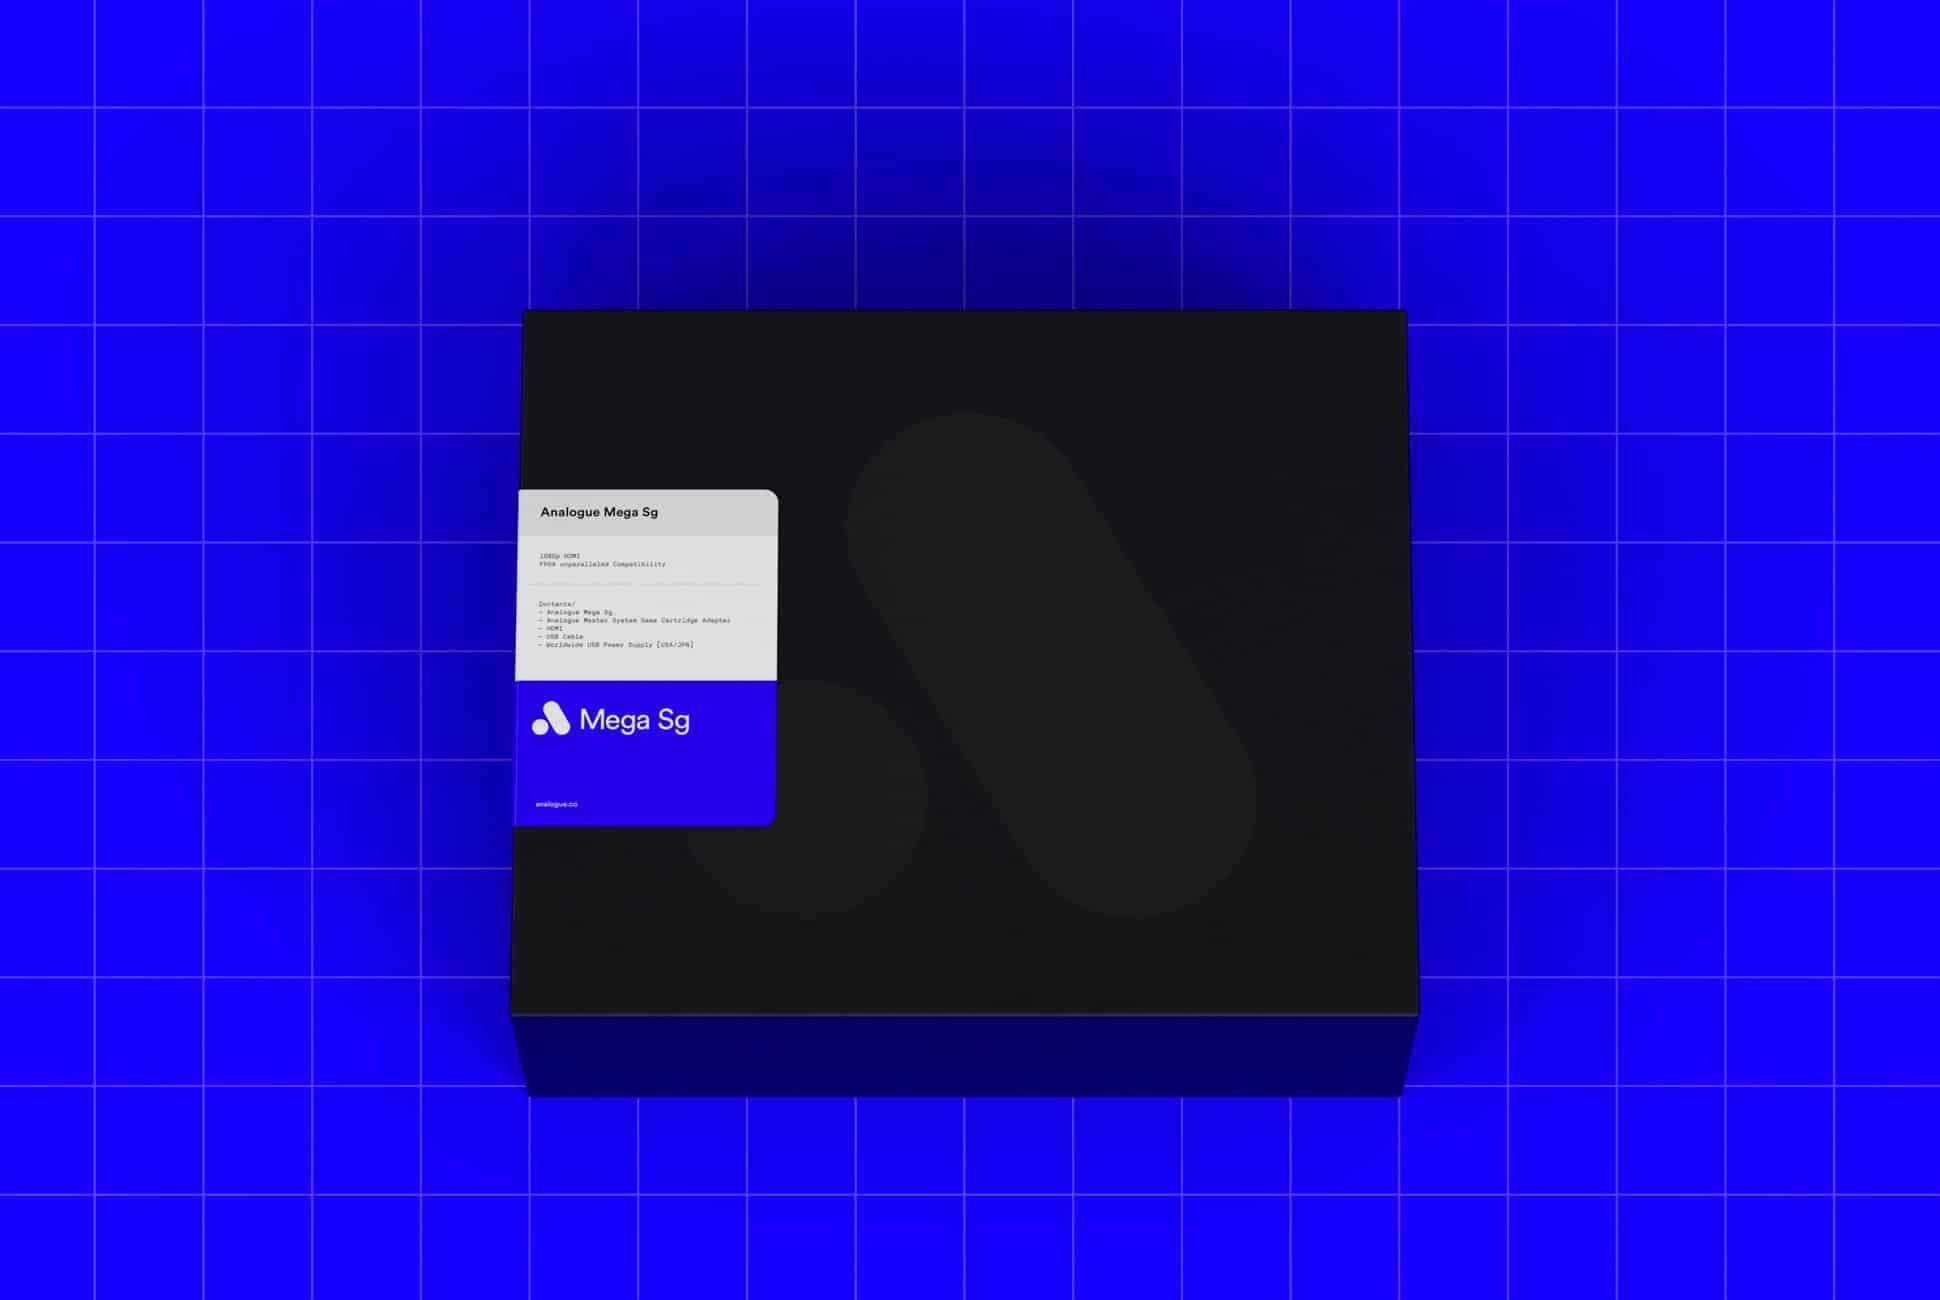 Analogue-Mega-Sg-Console-gear-patrol-slide-4